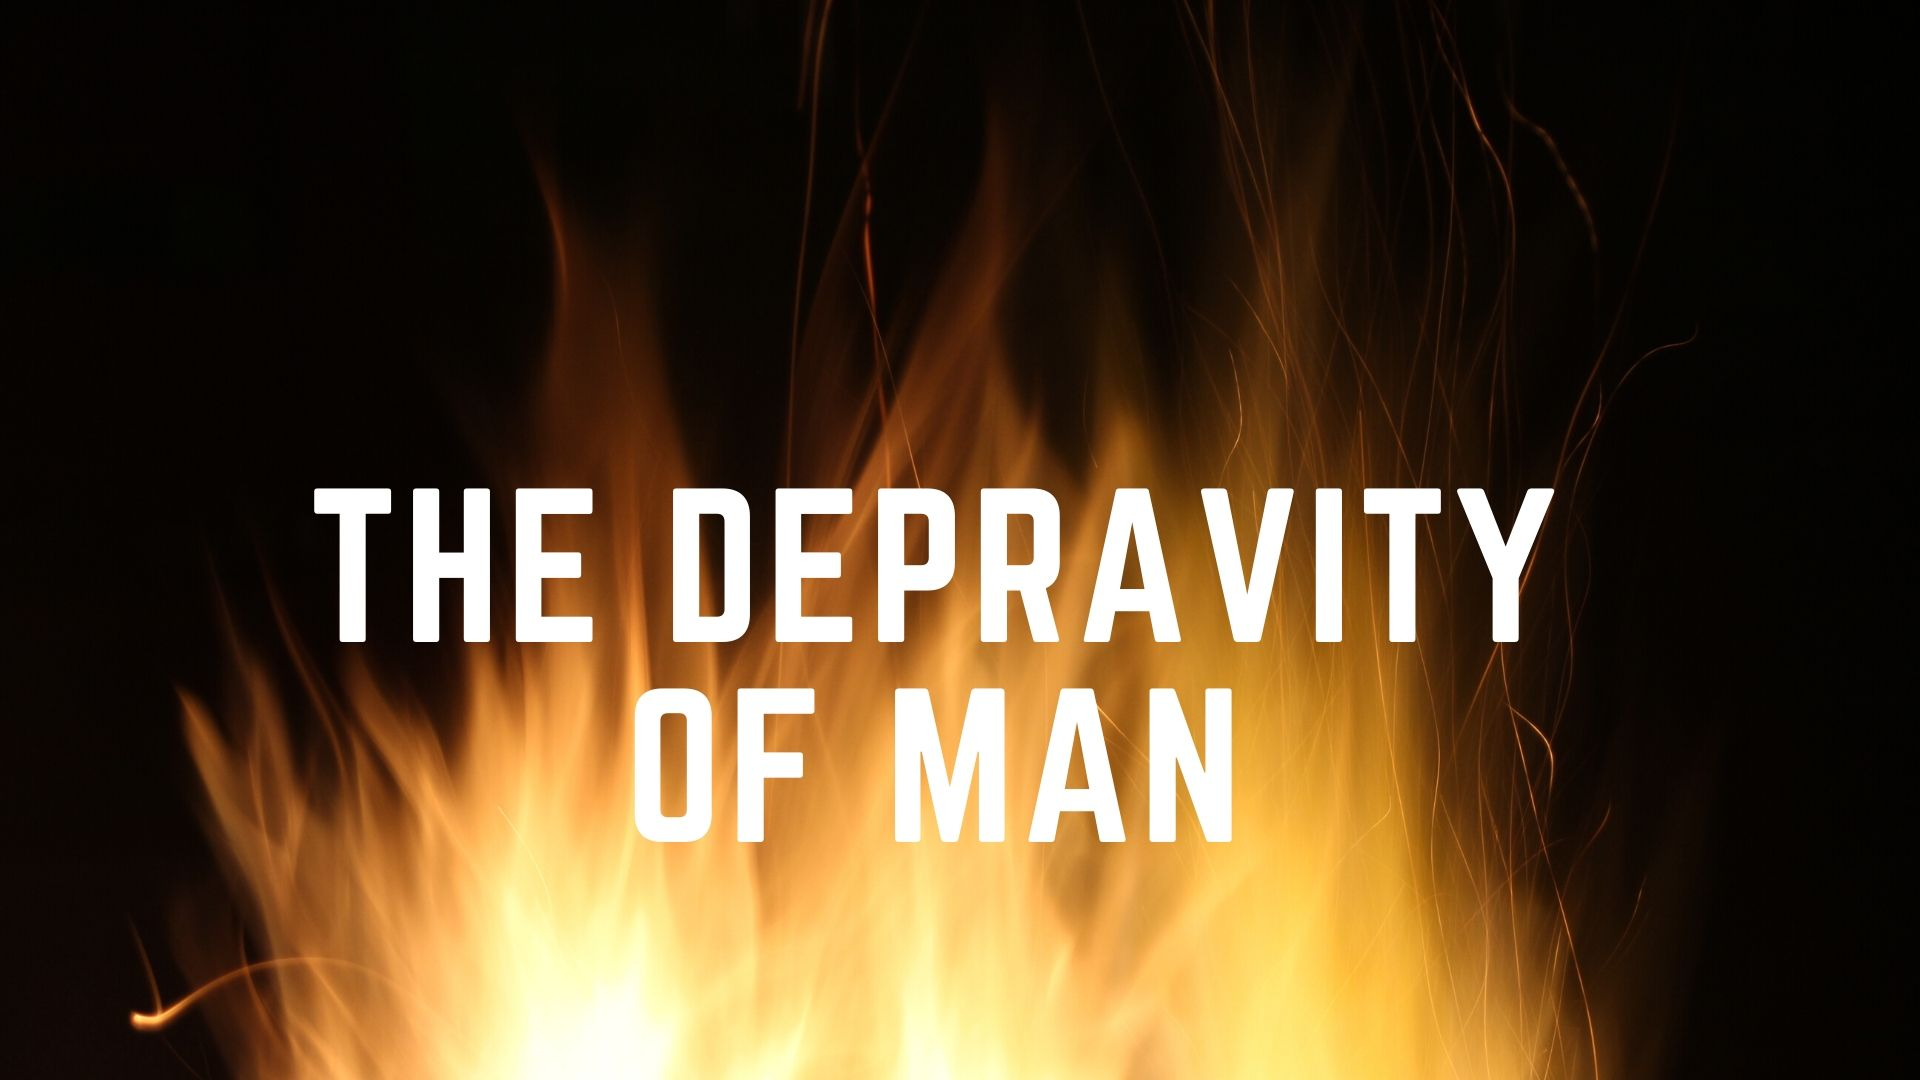 Depravity of Man (Graphic)